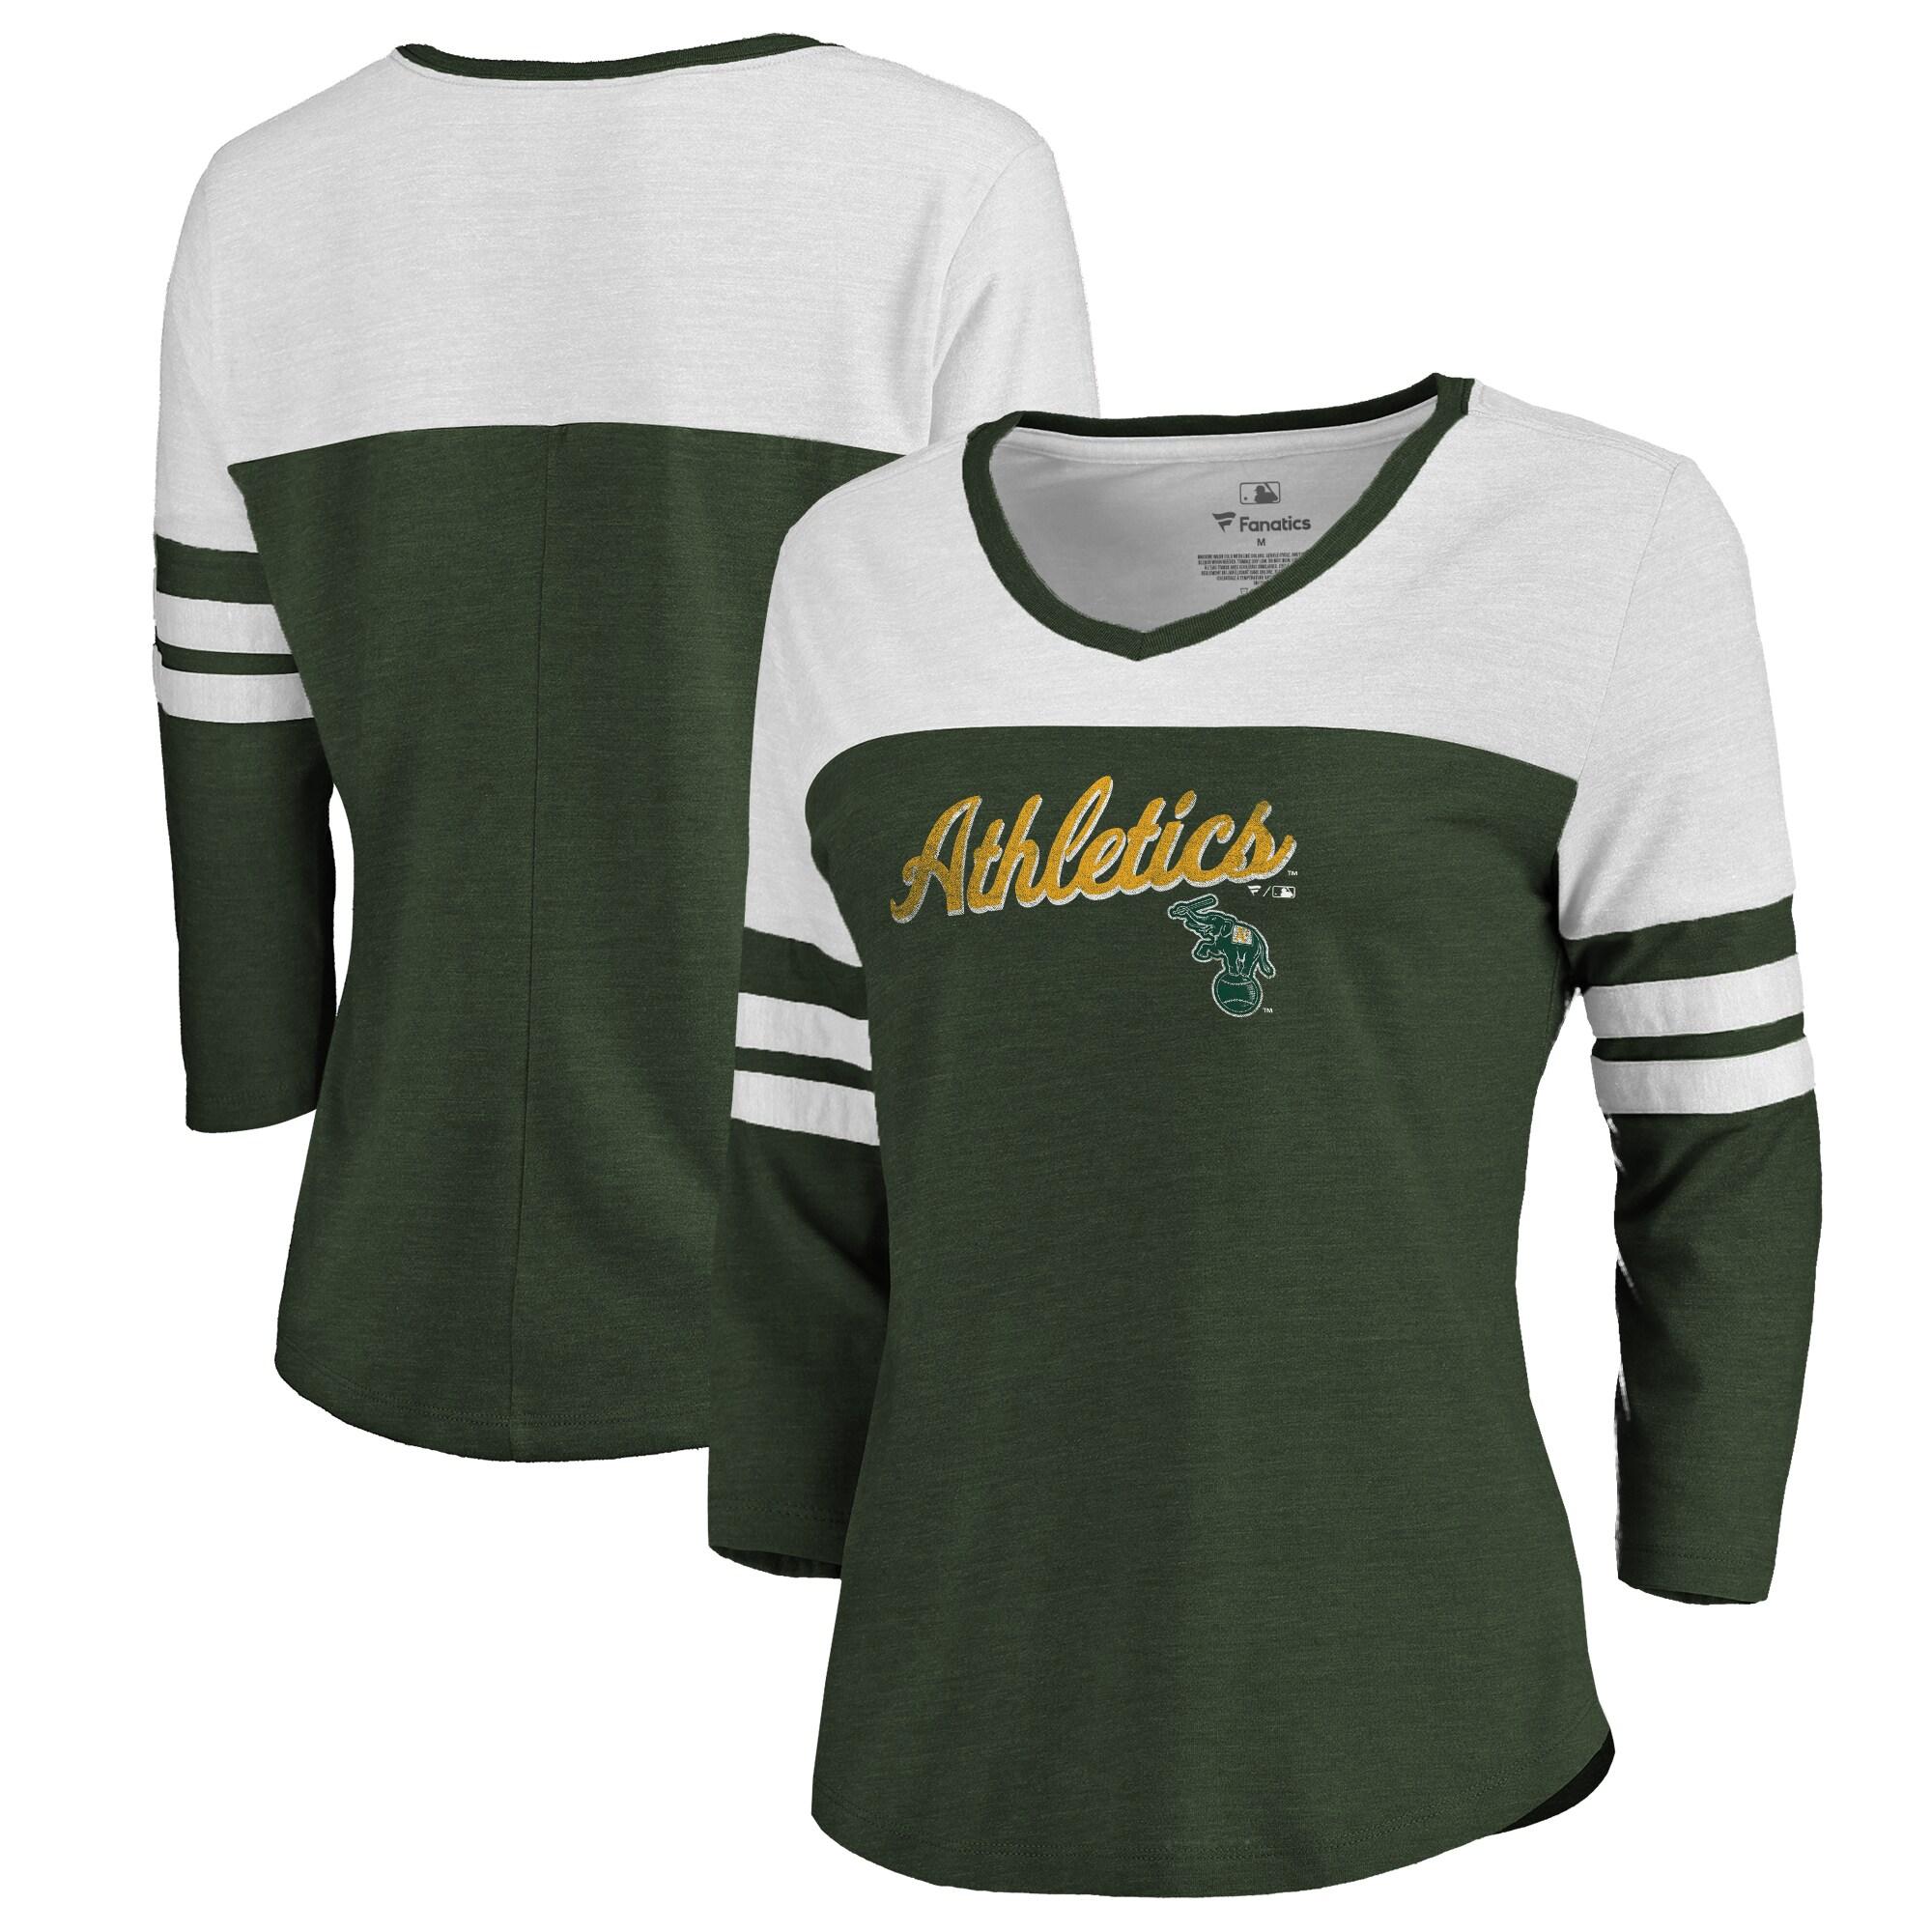 Fanatics Branded Oakland Athletics Women's Green Rising Script Color Block 3/4 Sleeve Tri-Blend T-Shirt